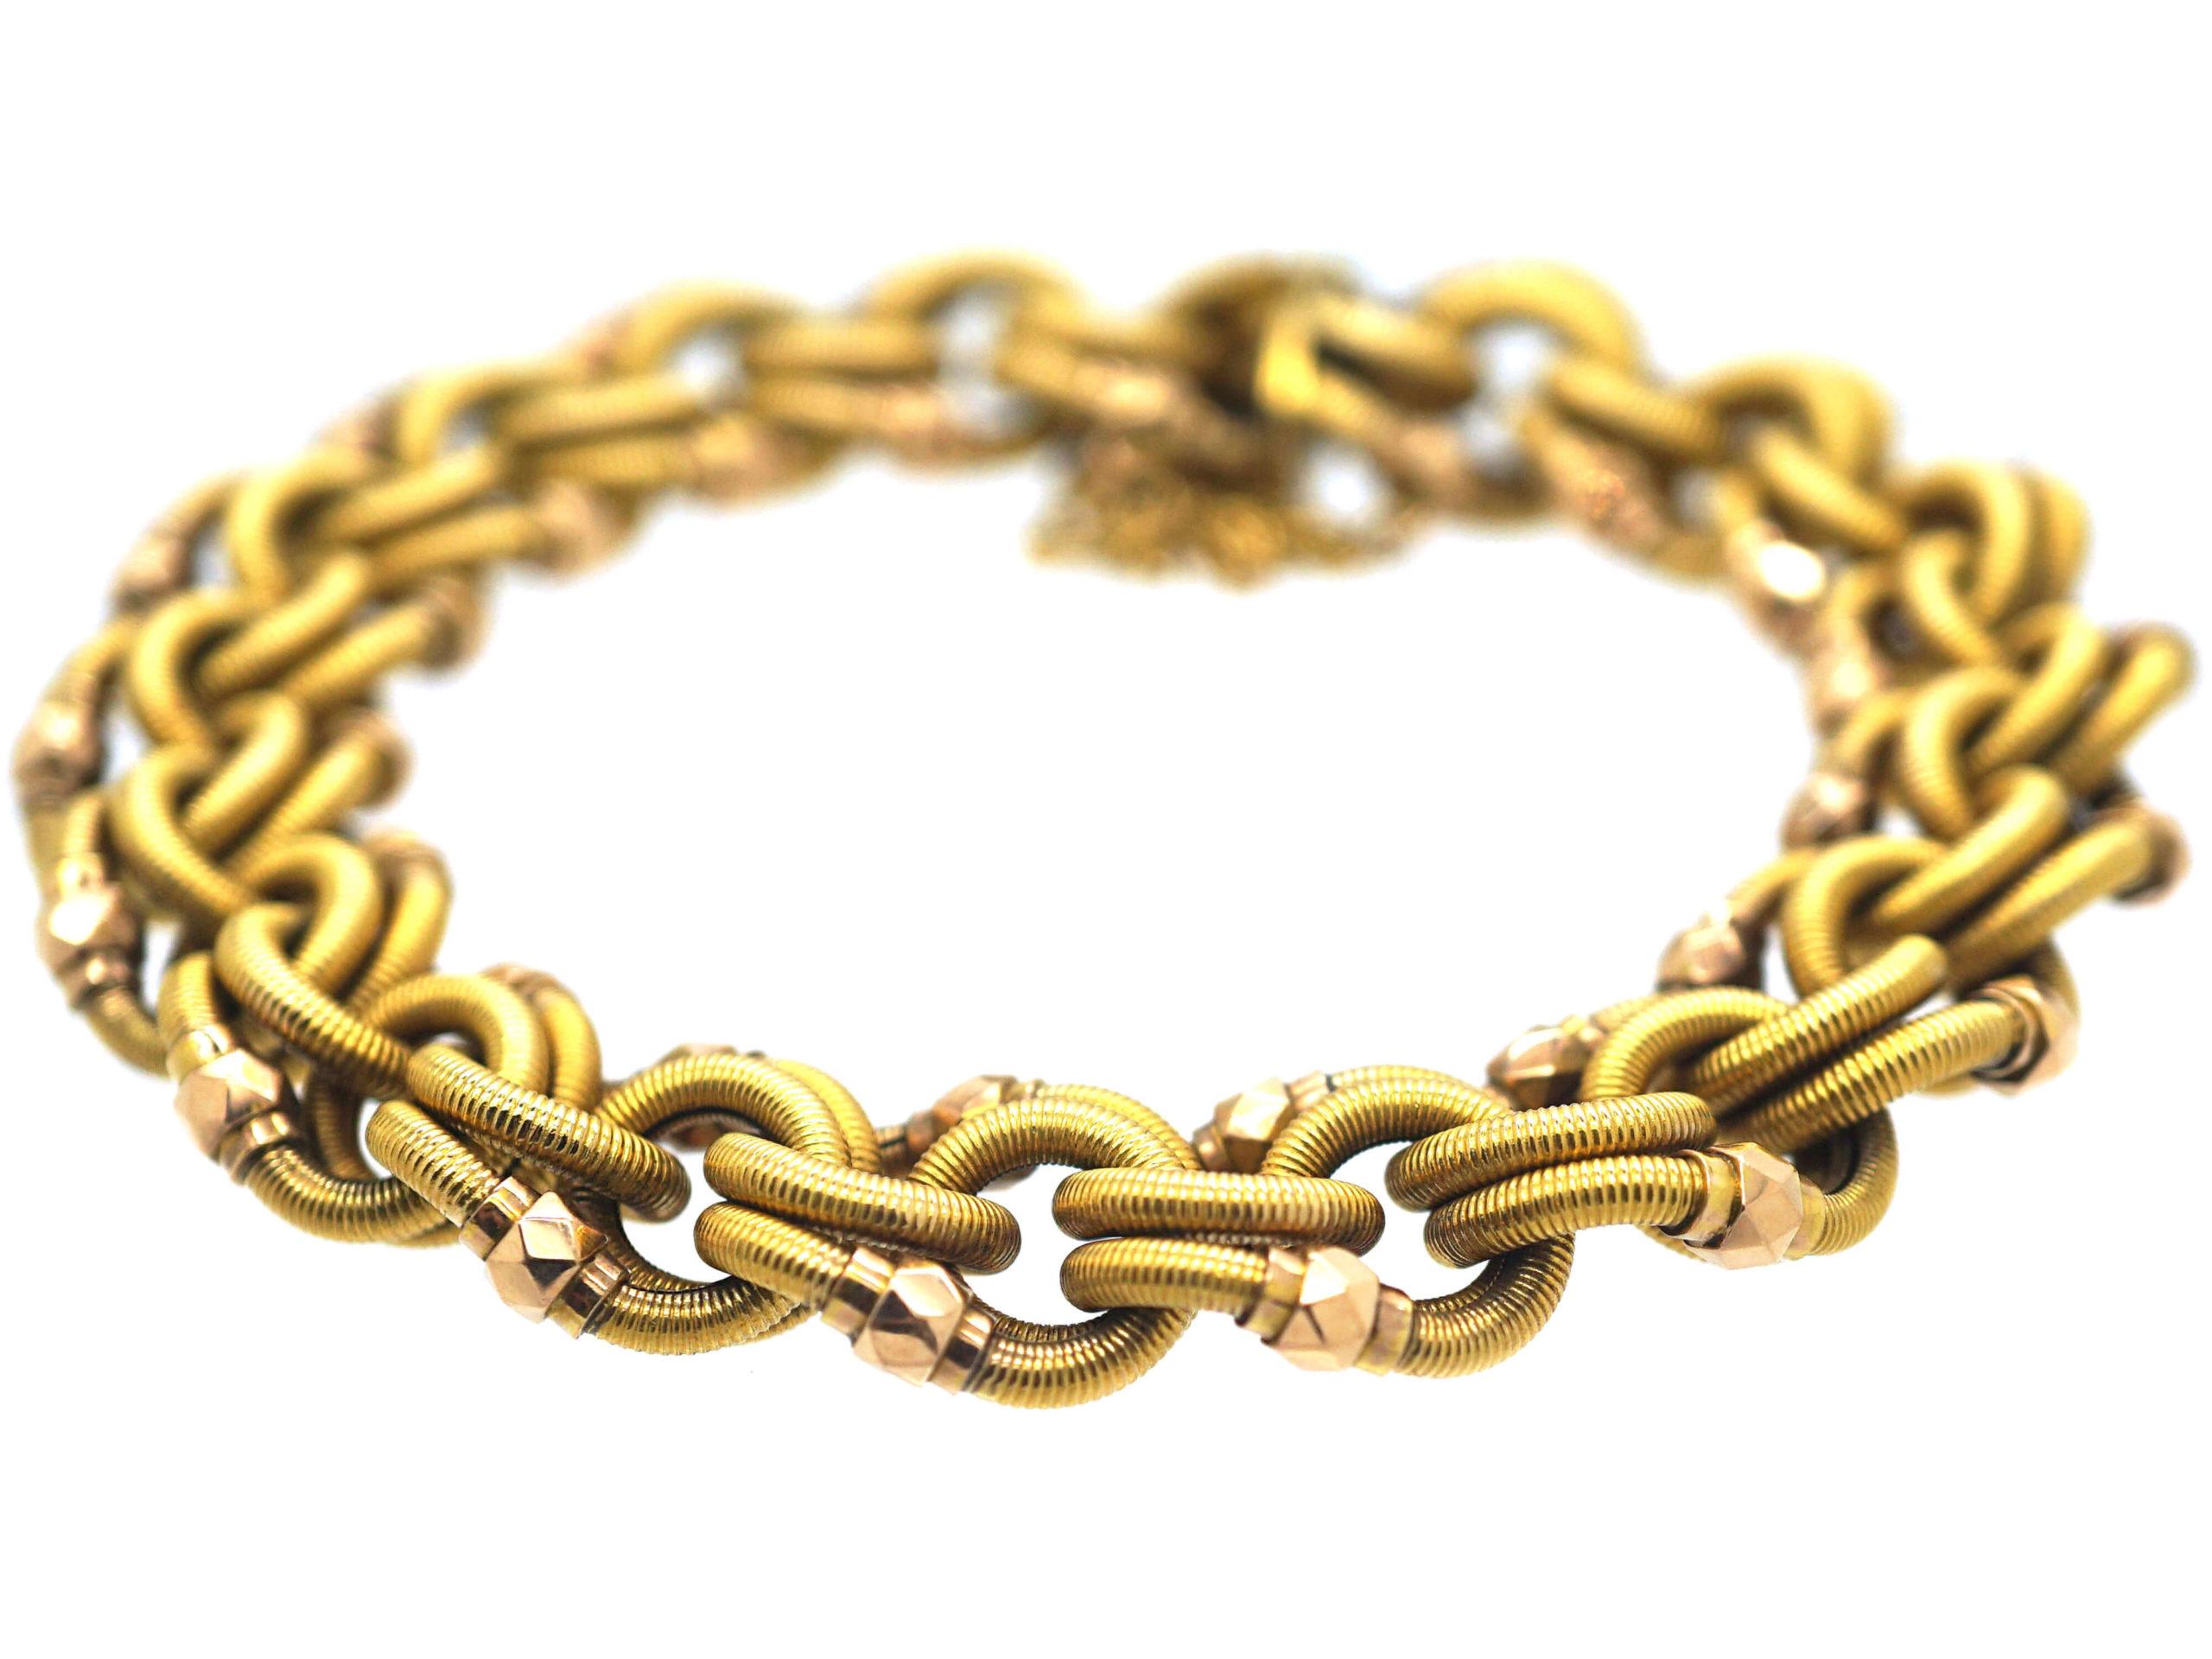 French Belle Epoque 18ct Two Colour Gold Woven Design Bracelet